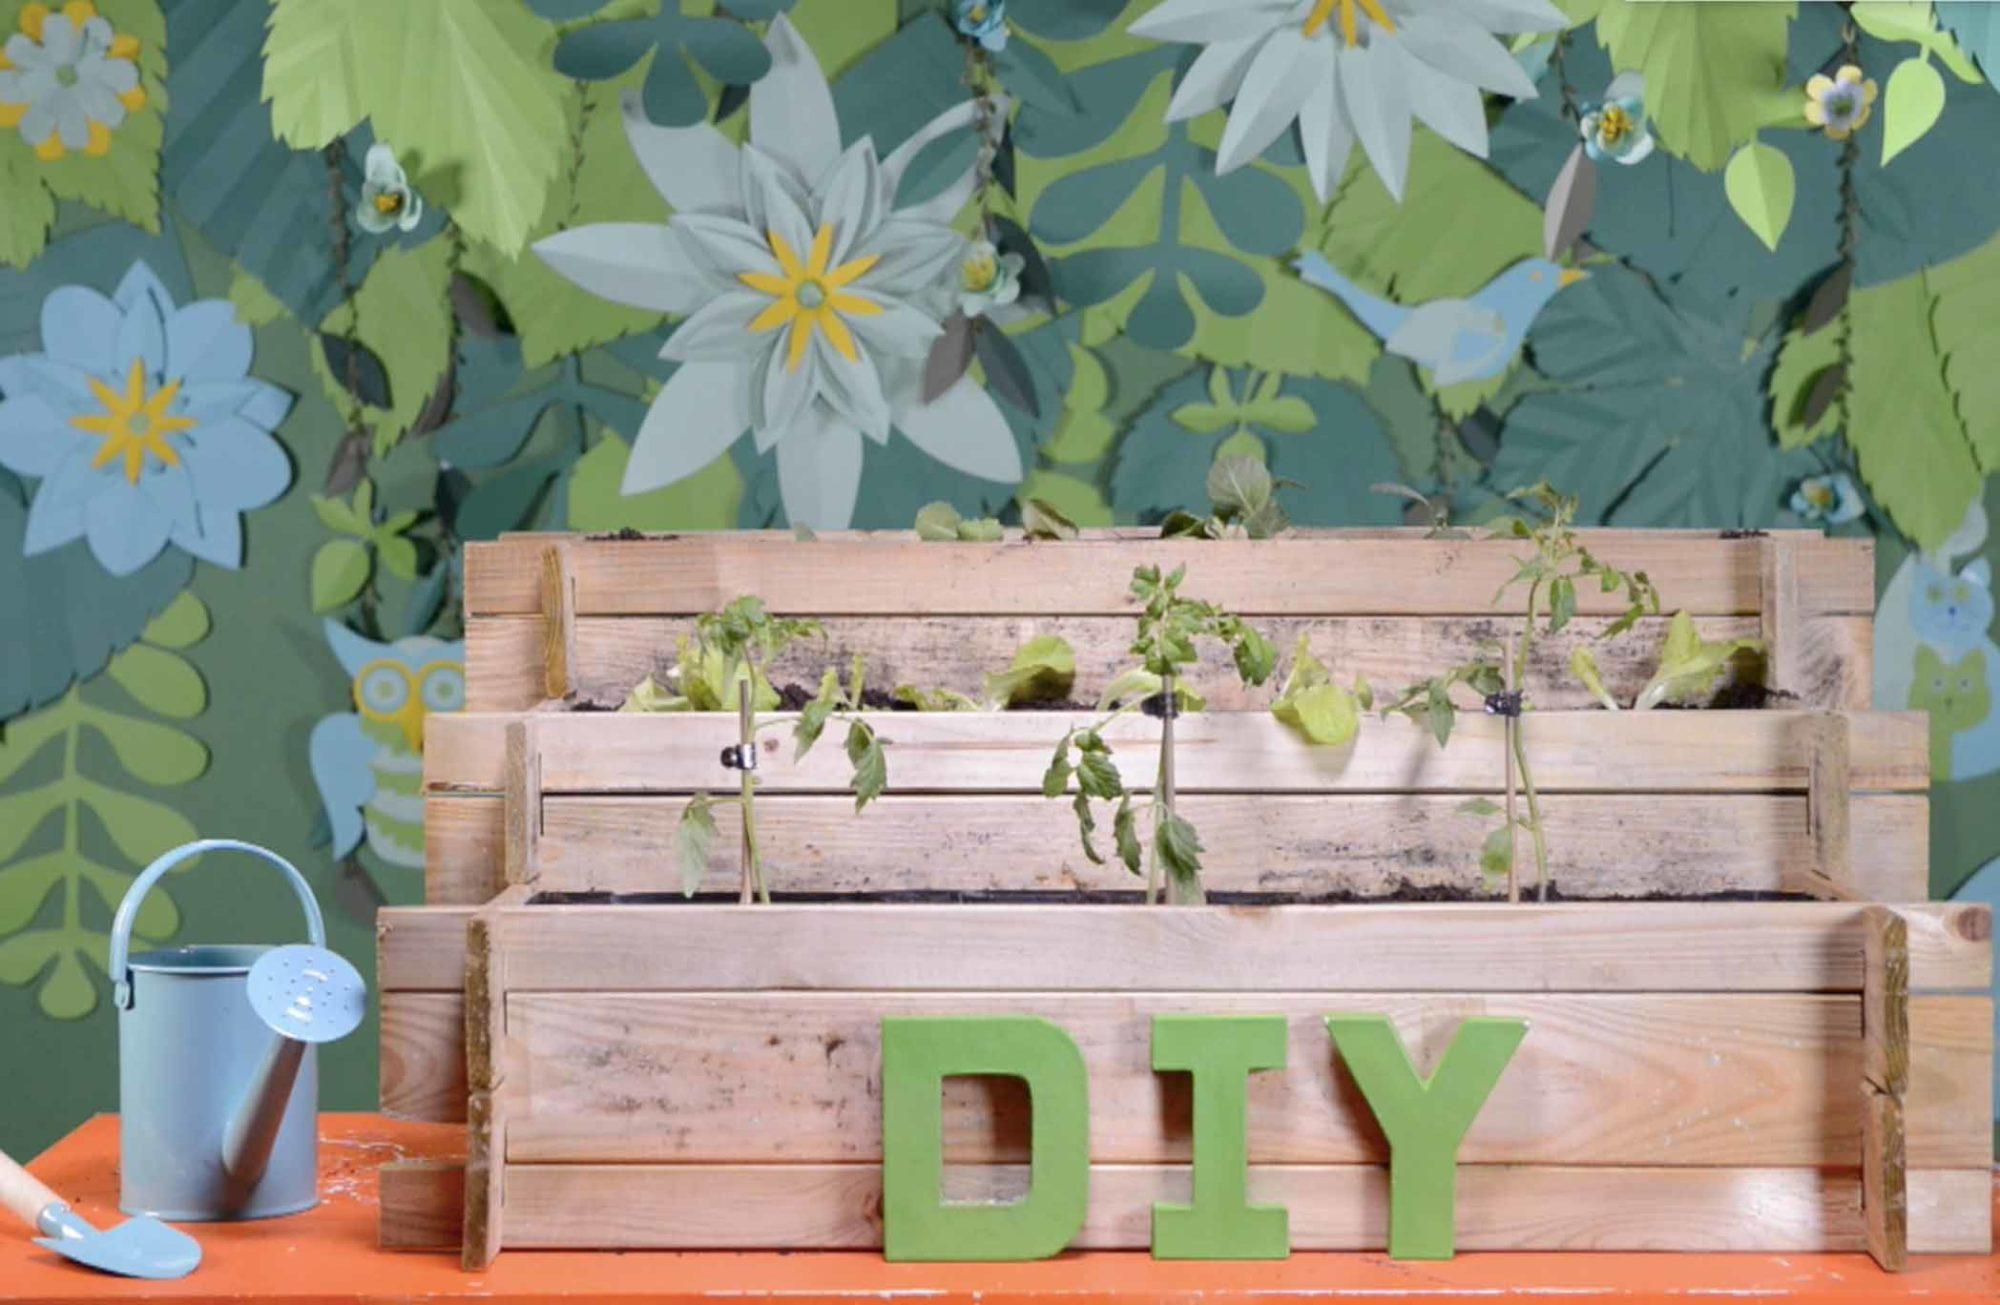 #DIY : Créer un carré potager